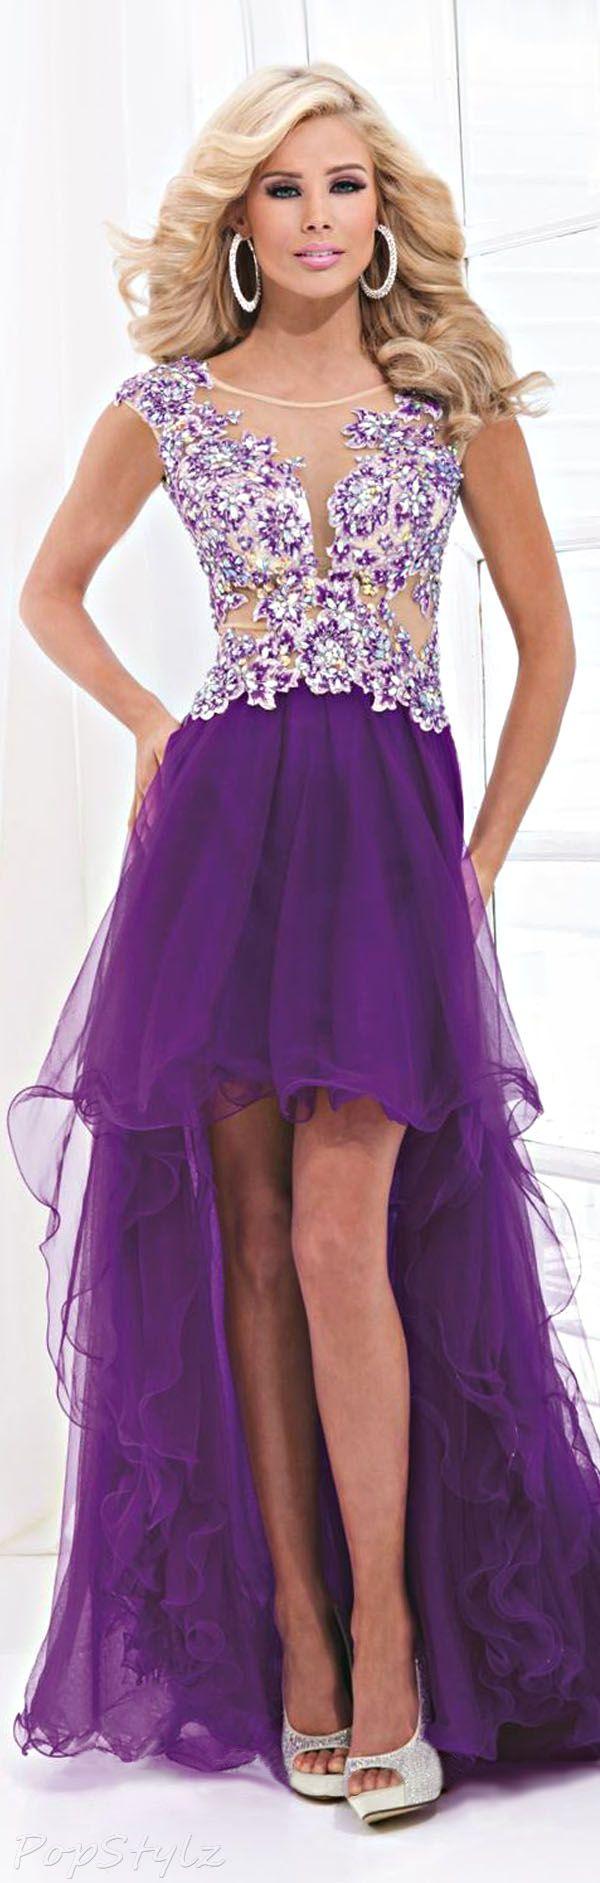 Tony Bowls Le Gala Gown ~chicagobrunette~